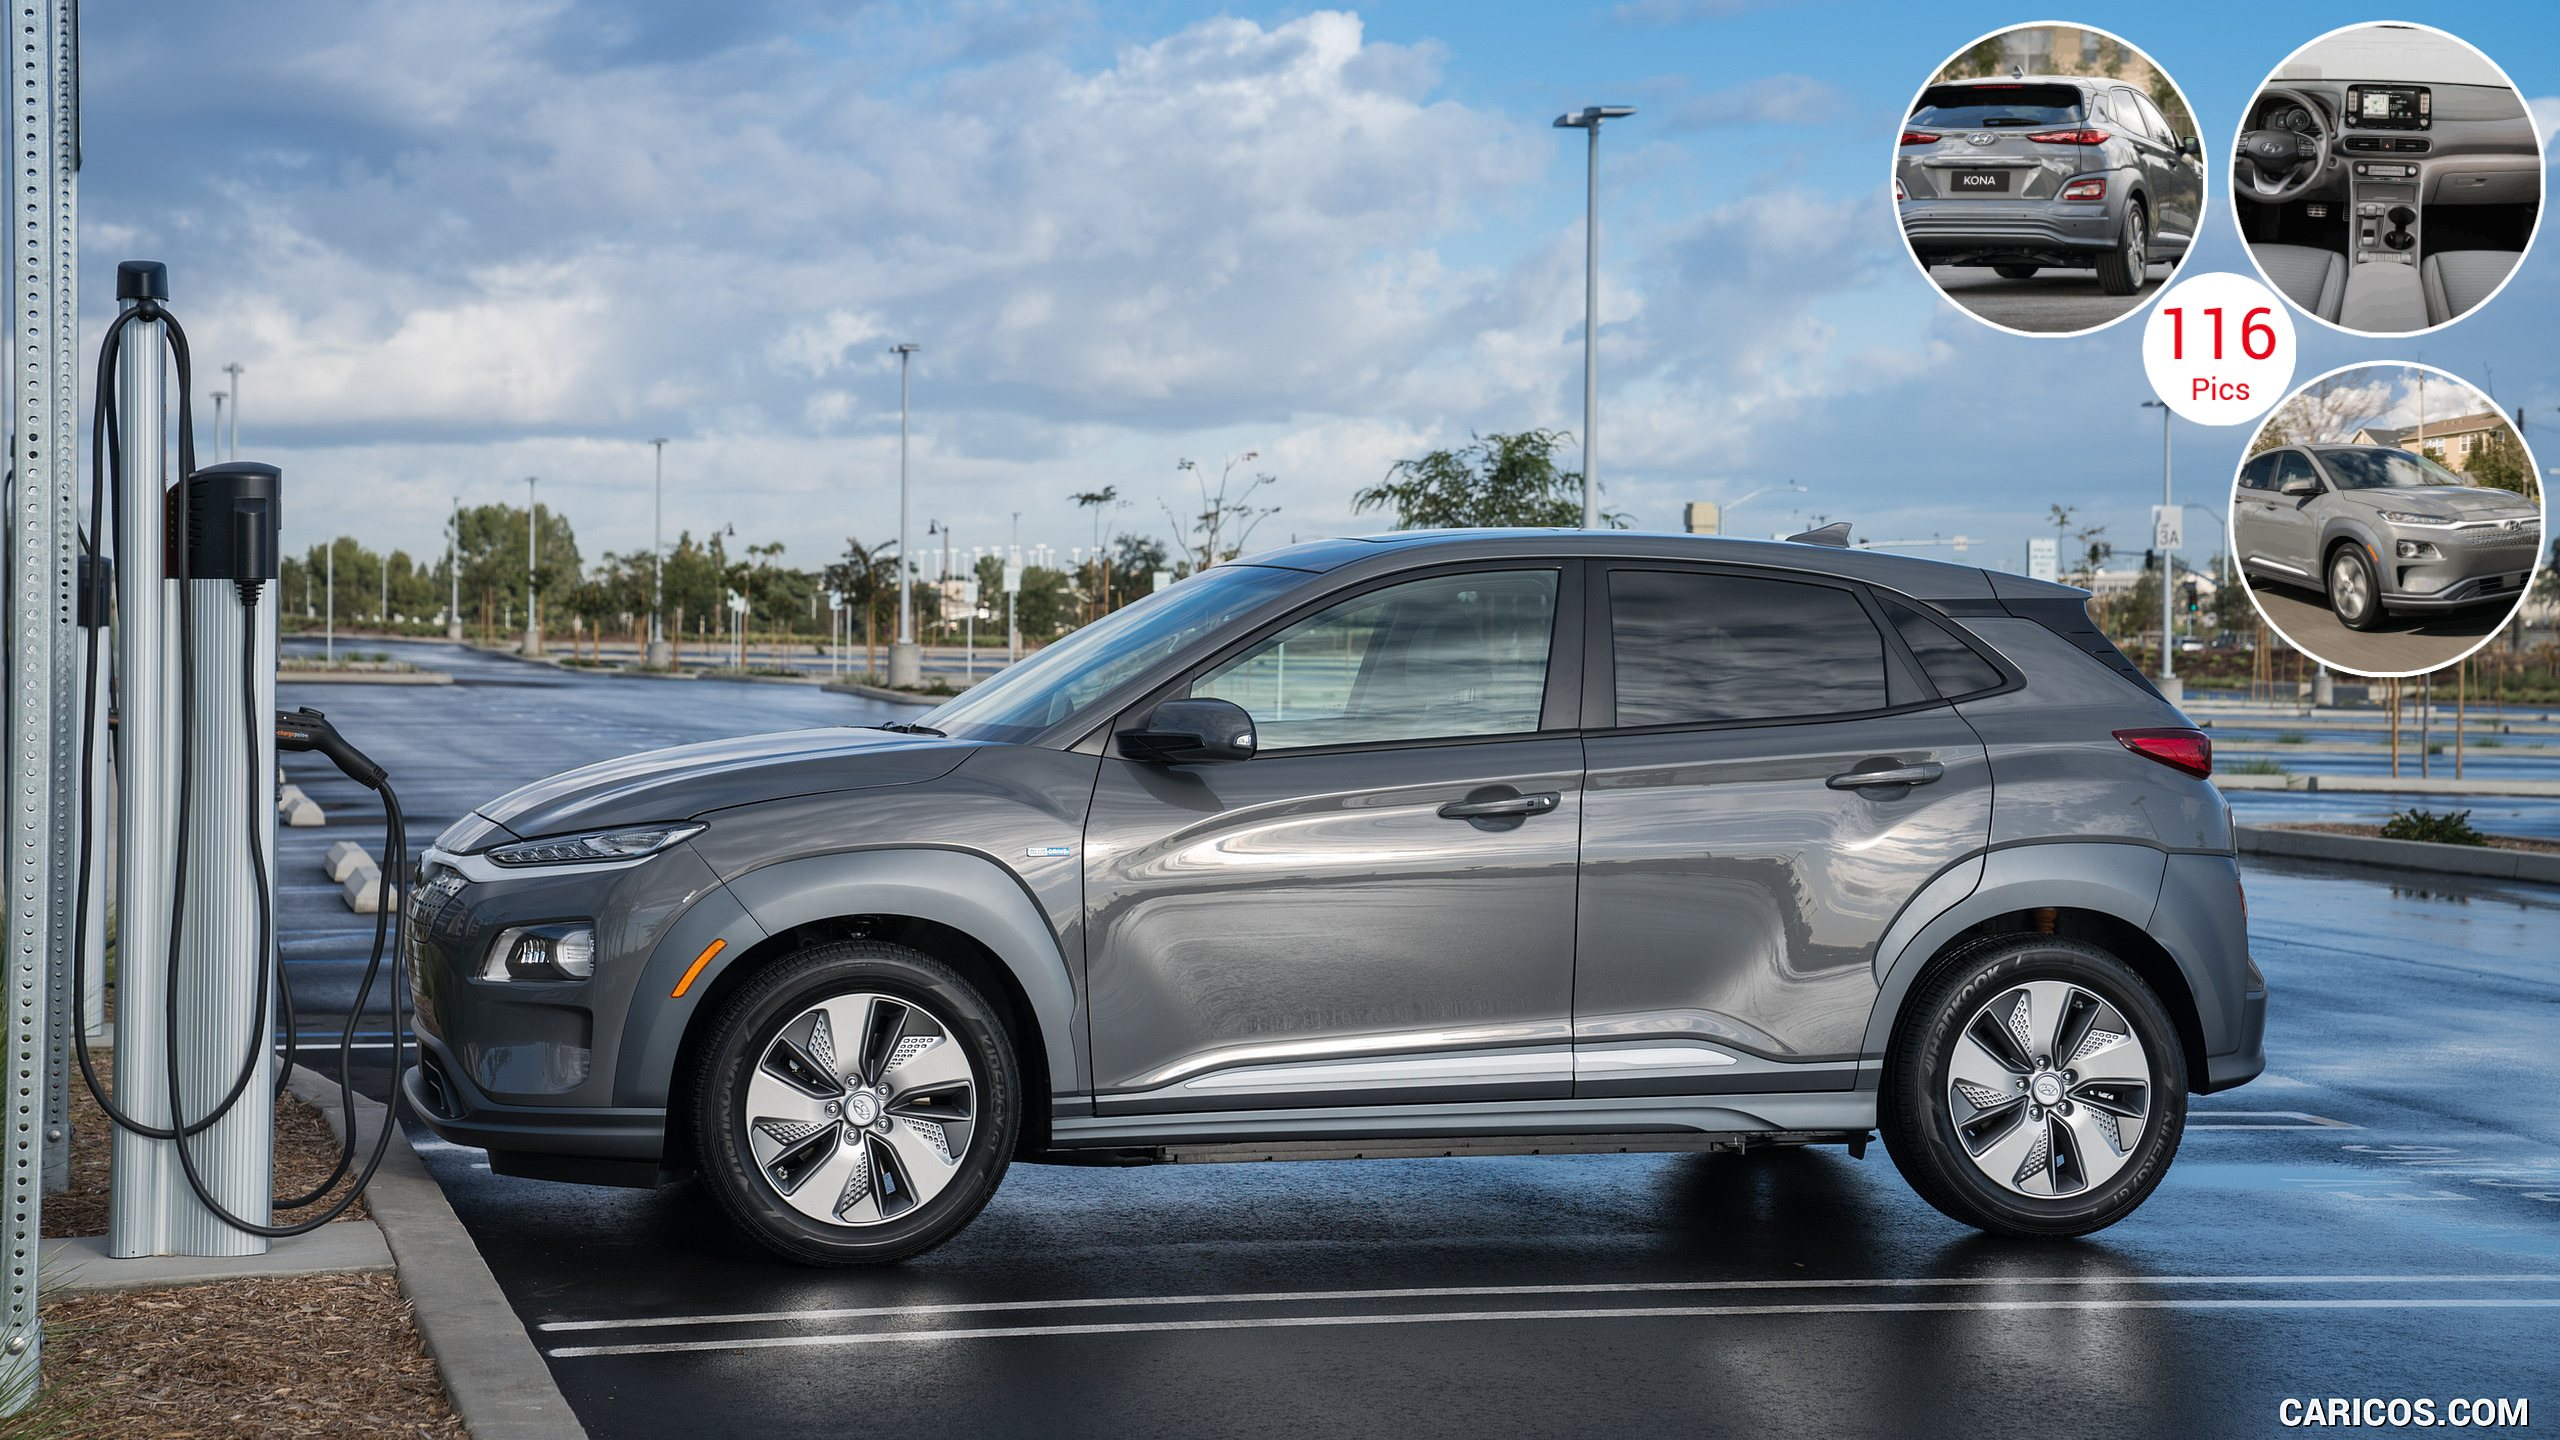 Siapkah Kita Menyambut Era Kendaraan Elektrifikasi?